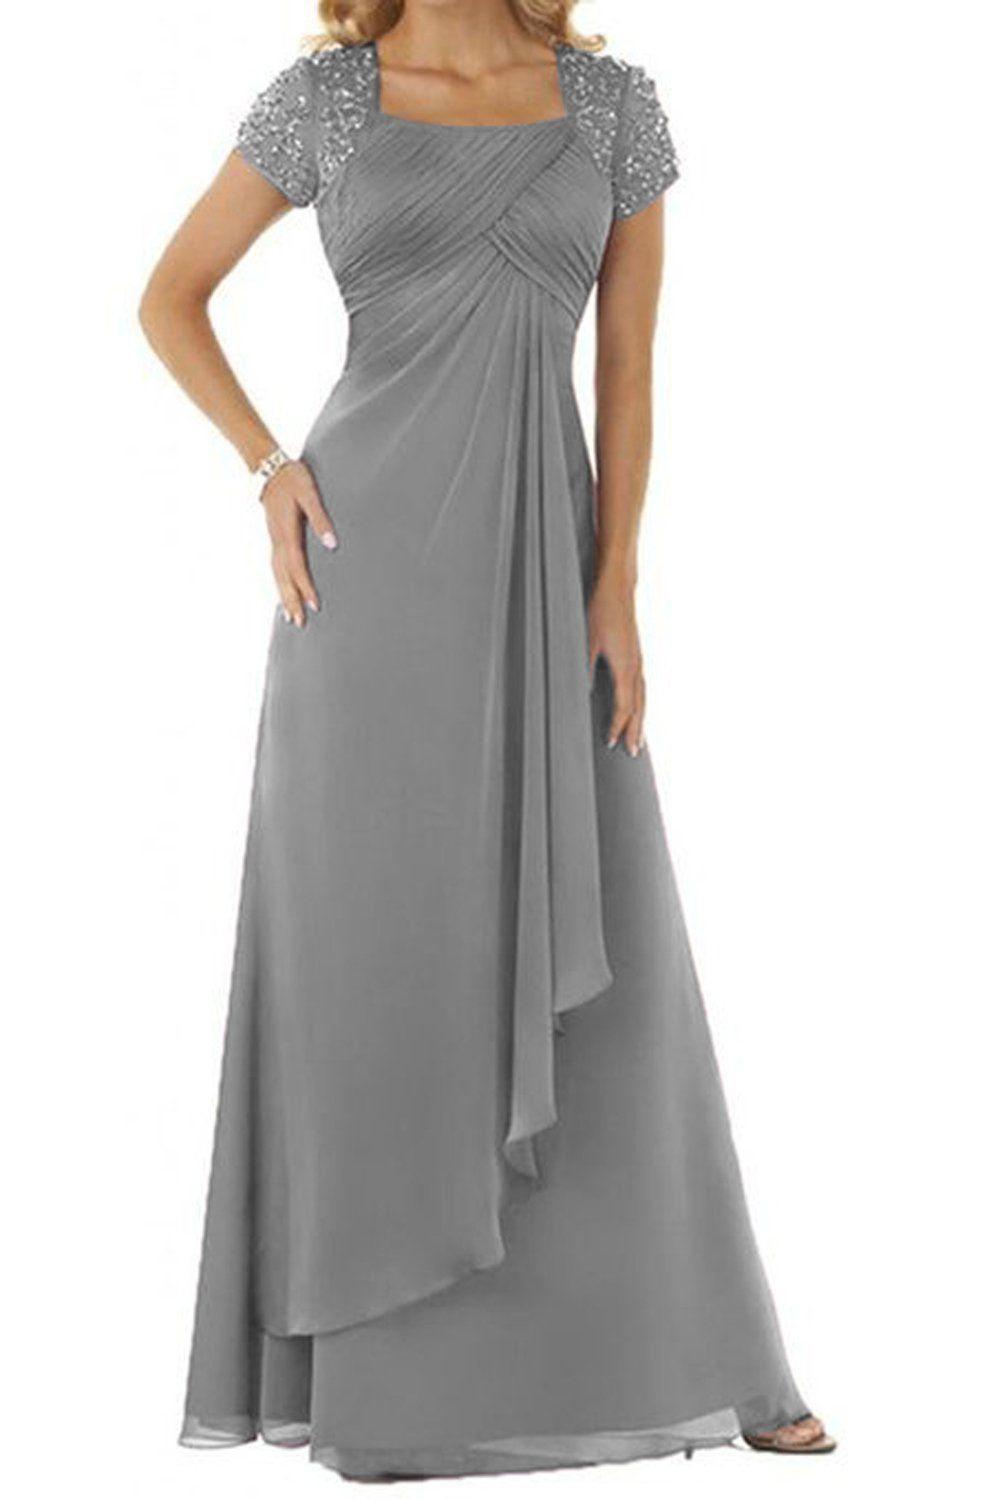 Maillsa Chiffon Square Mother Of Bride Dress With Rhinestones